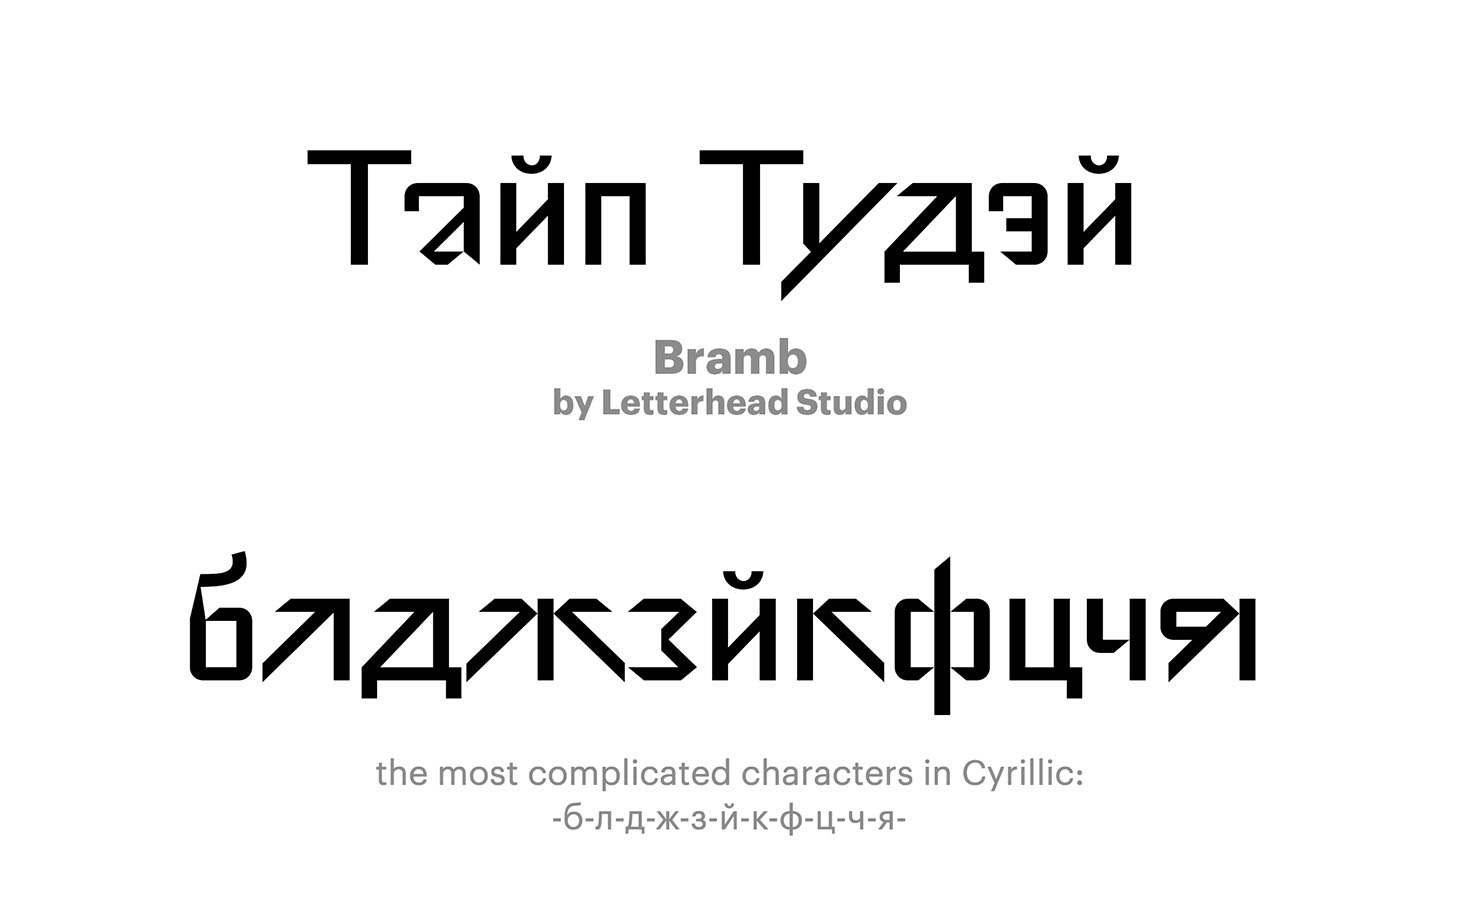 Bramb